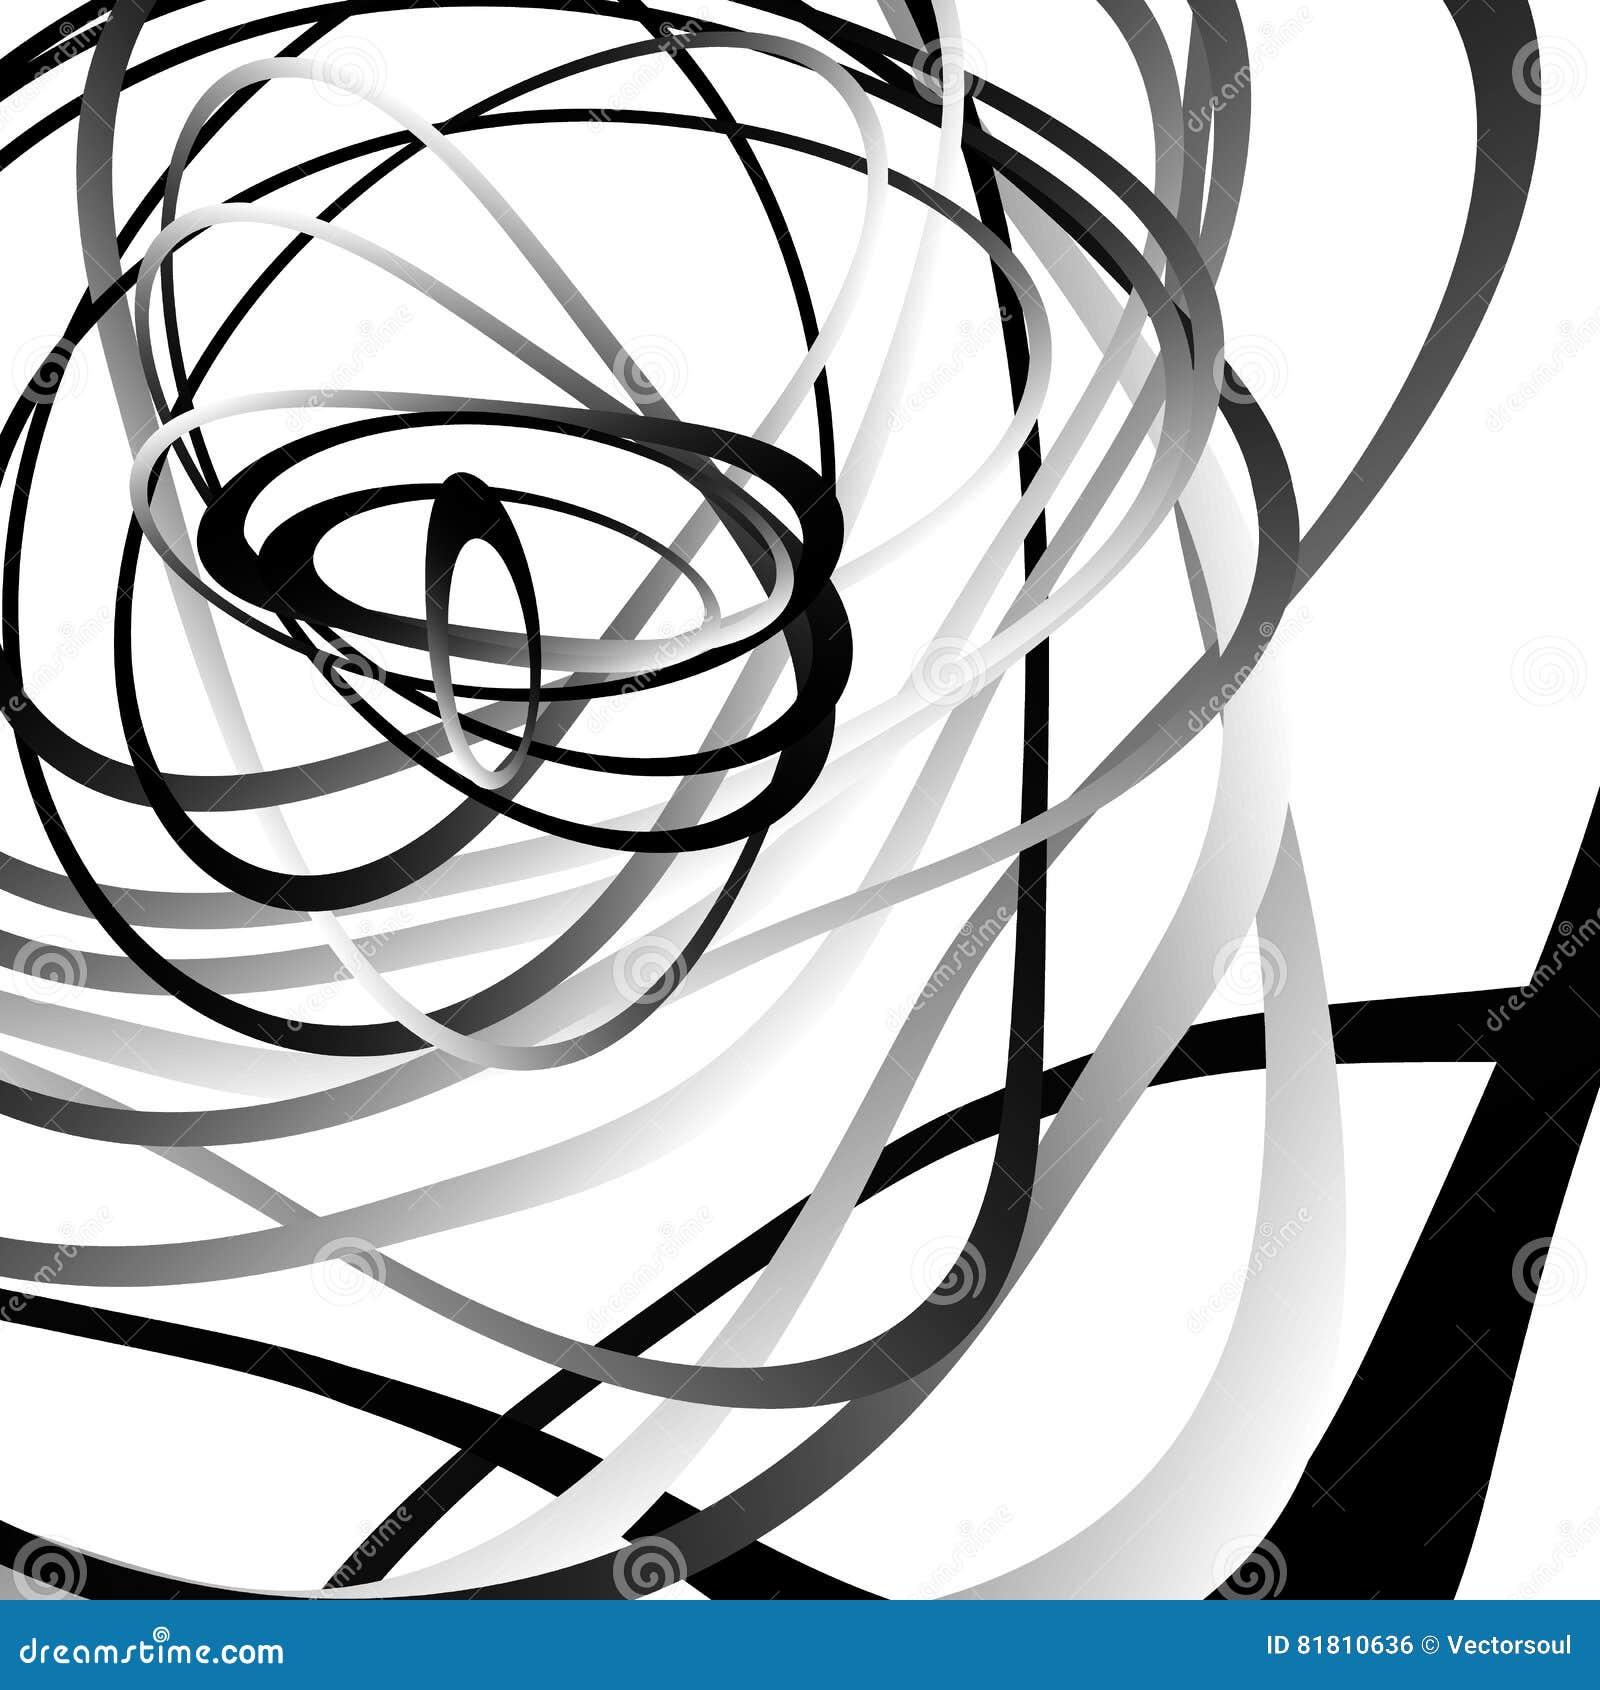 Abstrakter Squiggle, squiggly, curvy Linien Einfarbiges geometrisches p